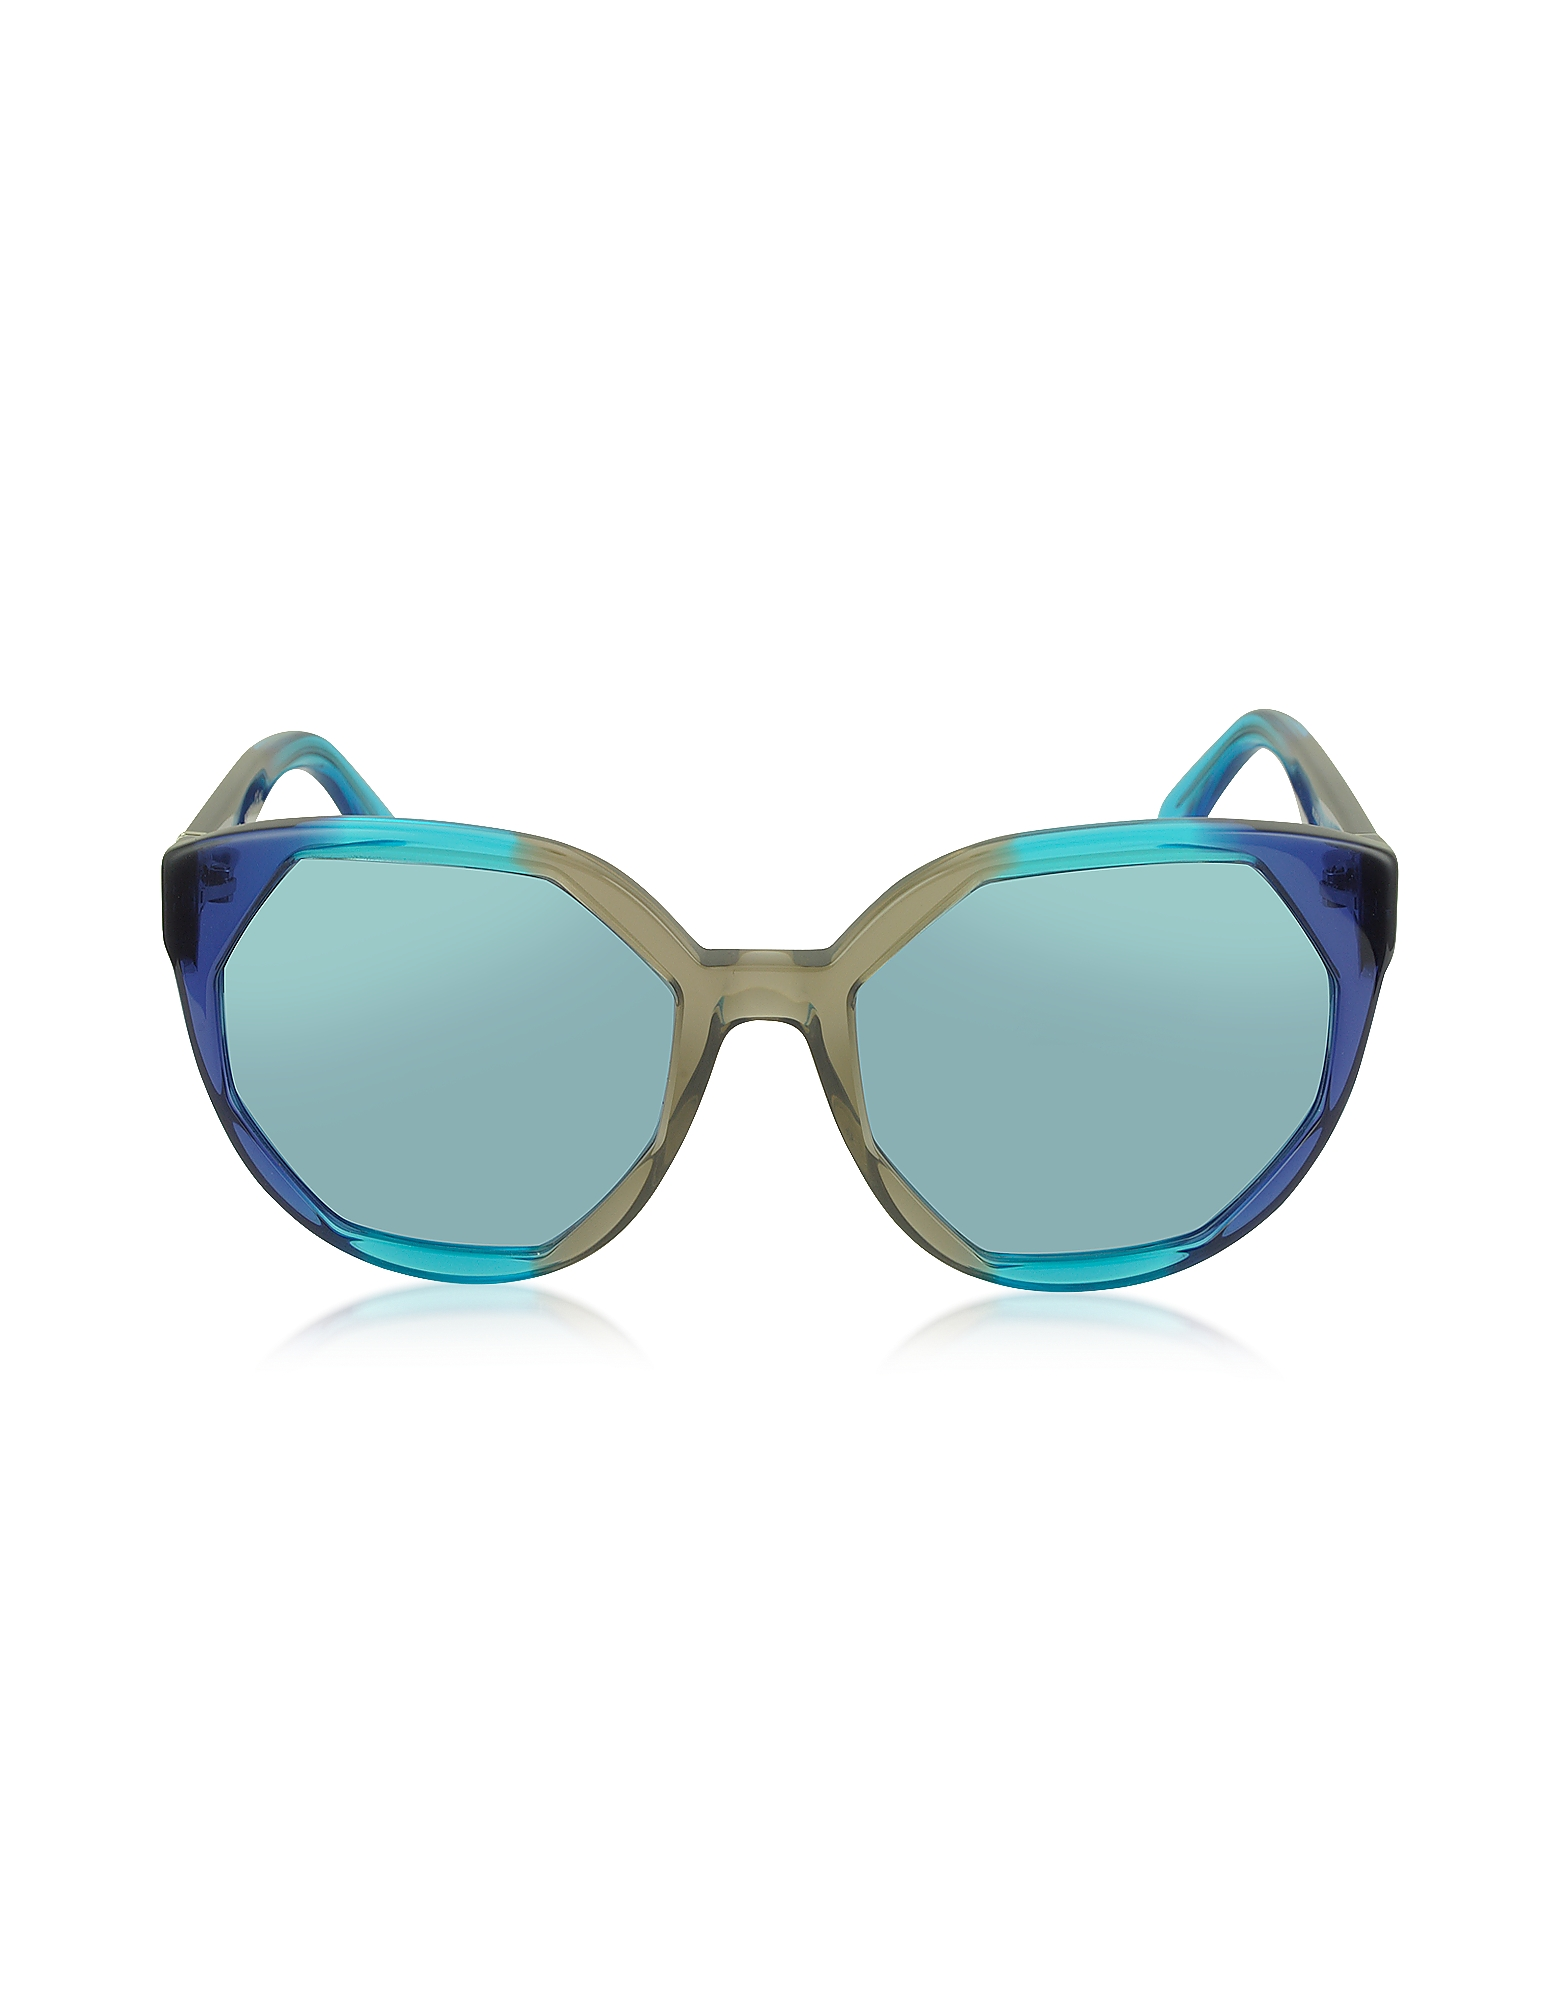 Marc Jacobs Sunglasses, MJ 585/S Oversized Round Sunglasses